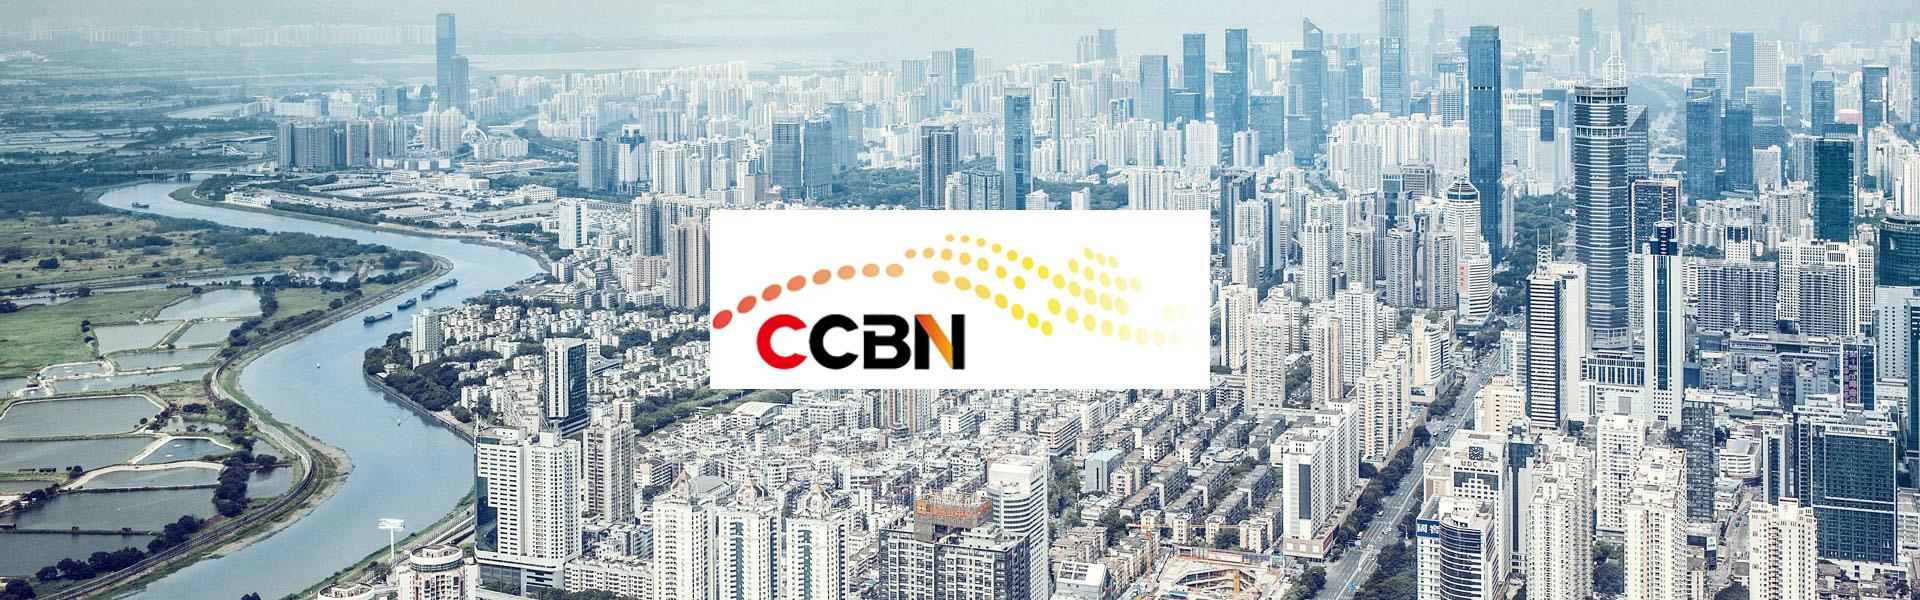 CCBN 2019 event logo